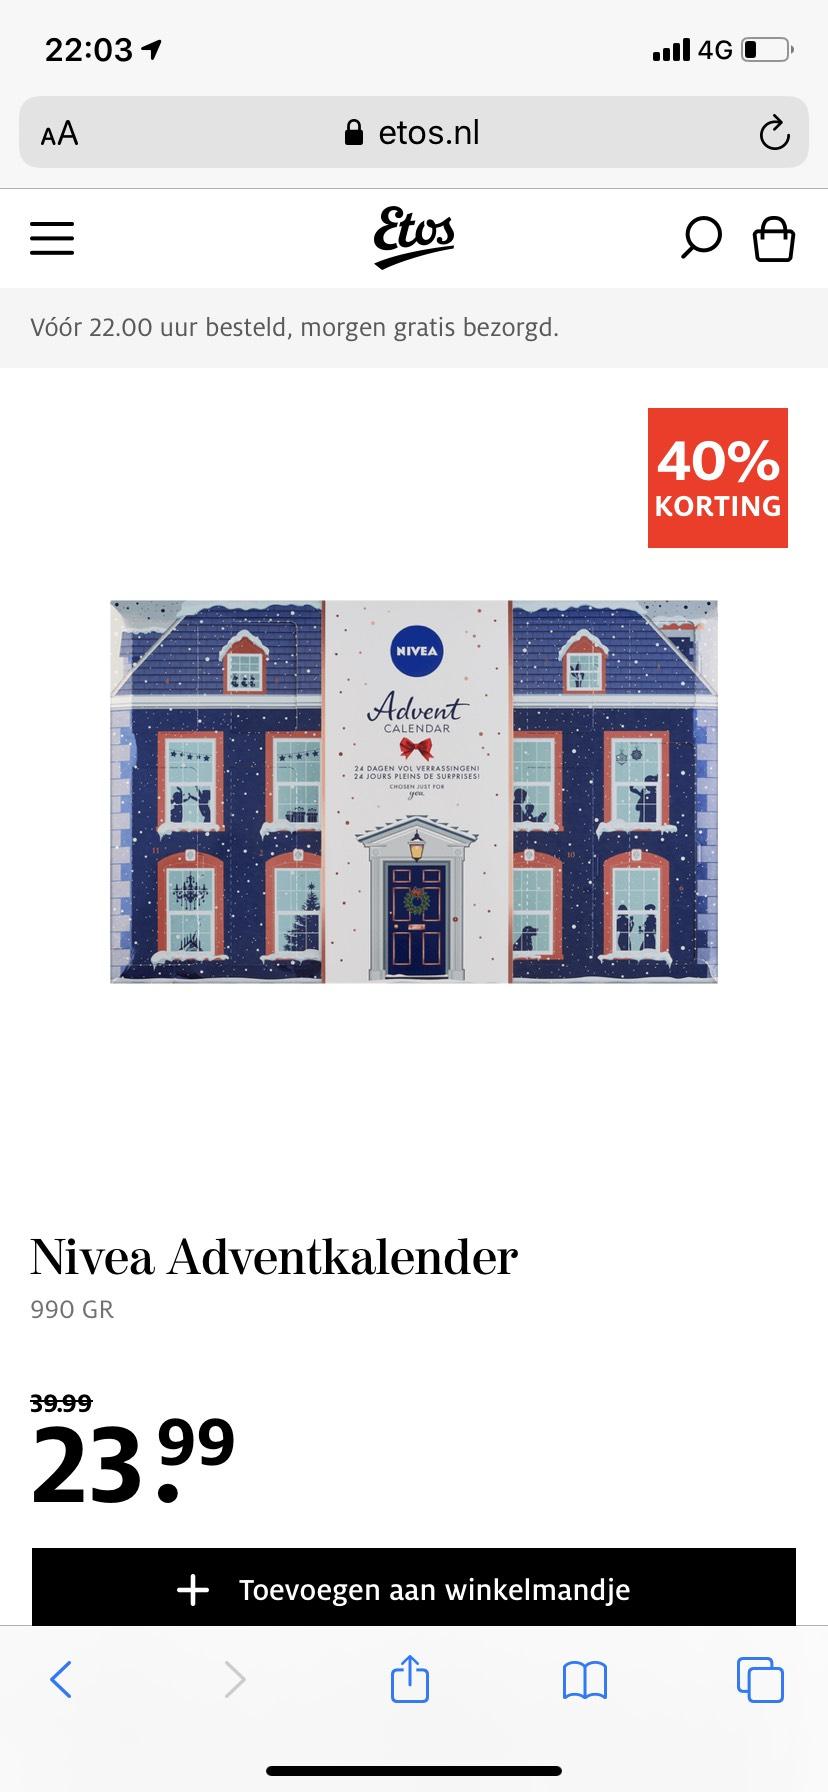 Nivea Adventskalender voor €23,99 ipv €39,99